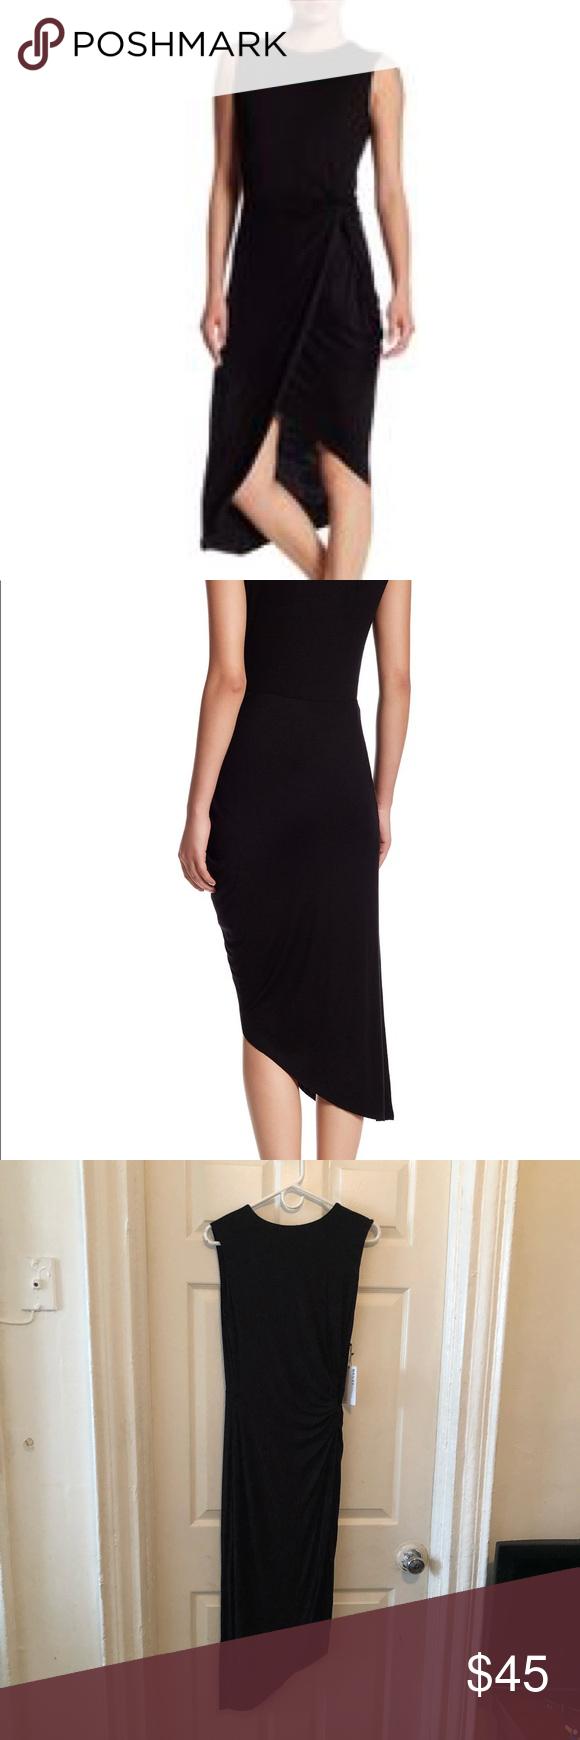 City Triangles Black Dress Size 18 In 2021 Black Dress Size 18 Size 18 Dress Sheer Mini Dress [ 1740 x 580 Pixel ]